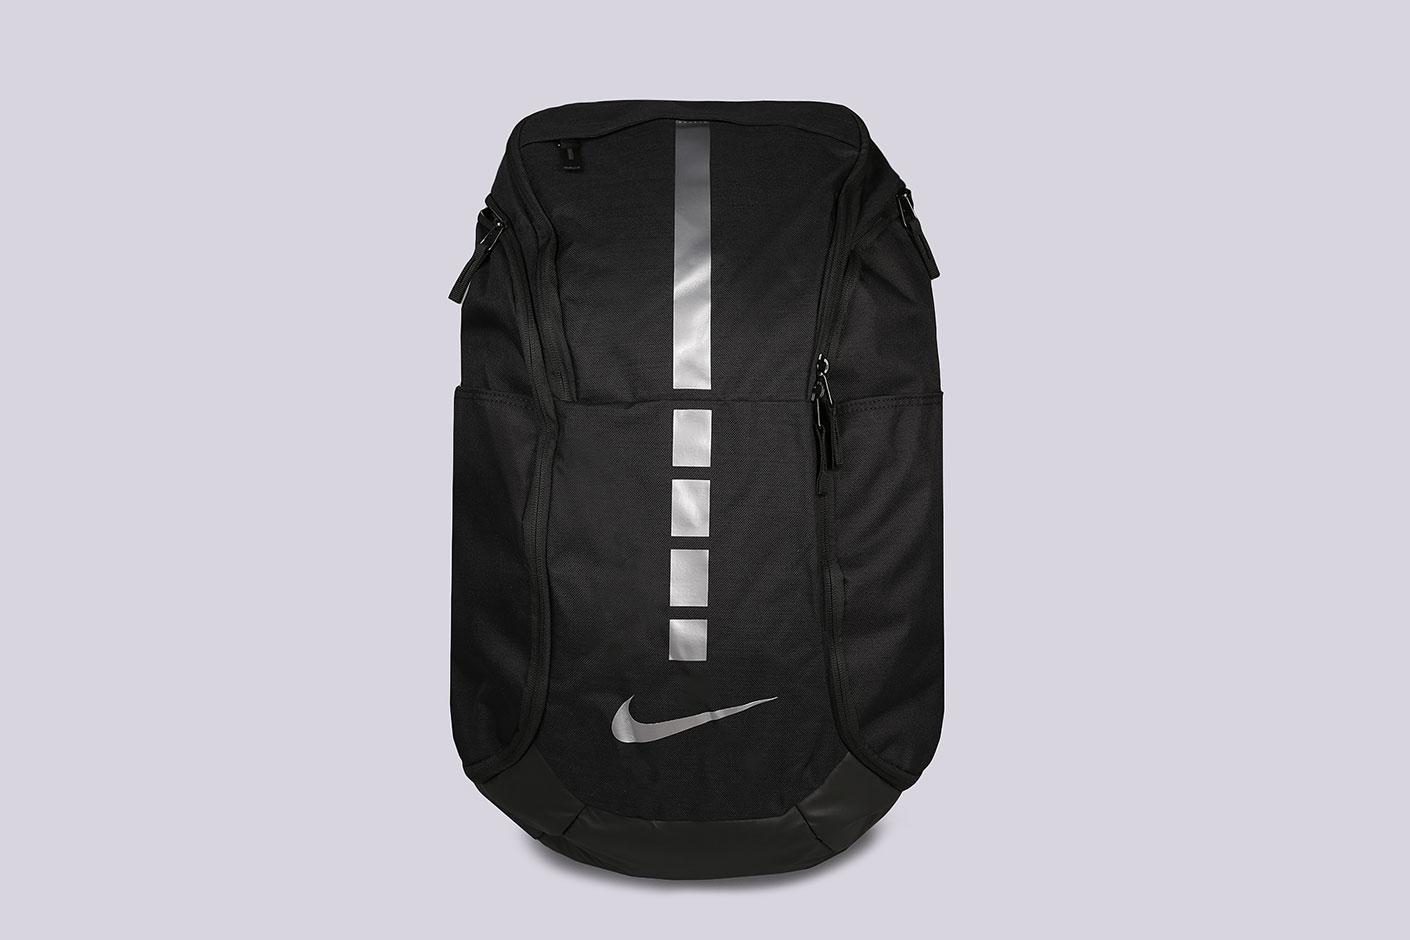 418e9b6df30 Черный рюкзак Hoops Elite Pro Basketball Backpack 38L от Nike ...